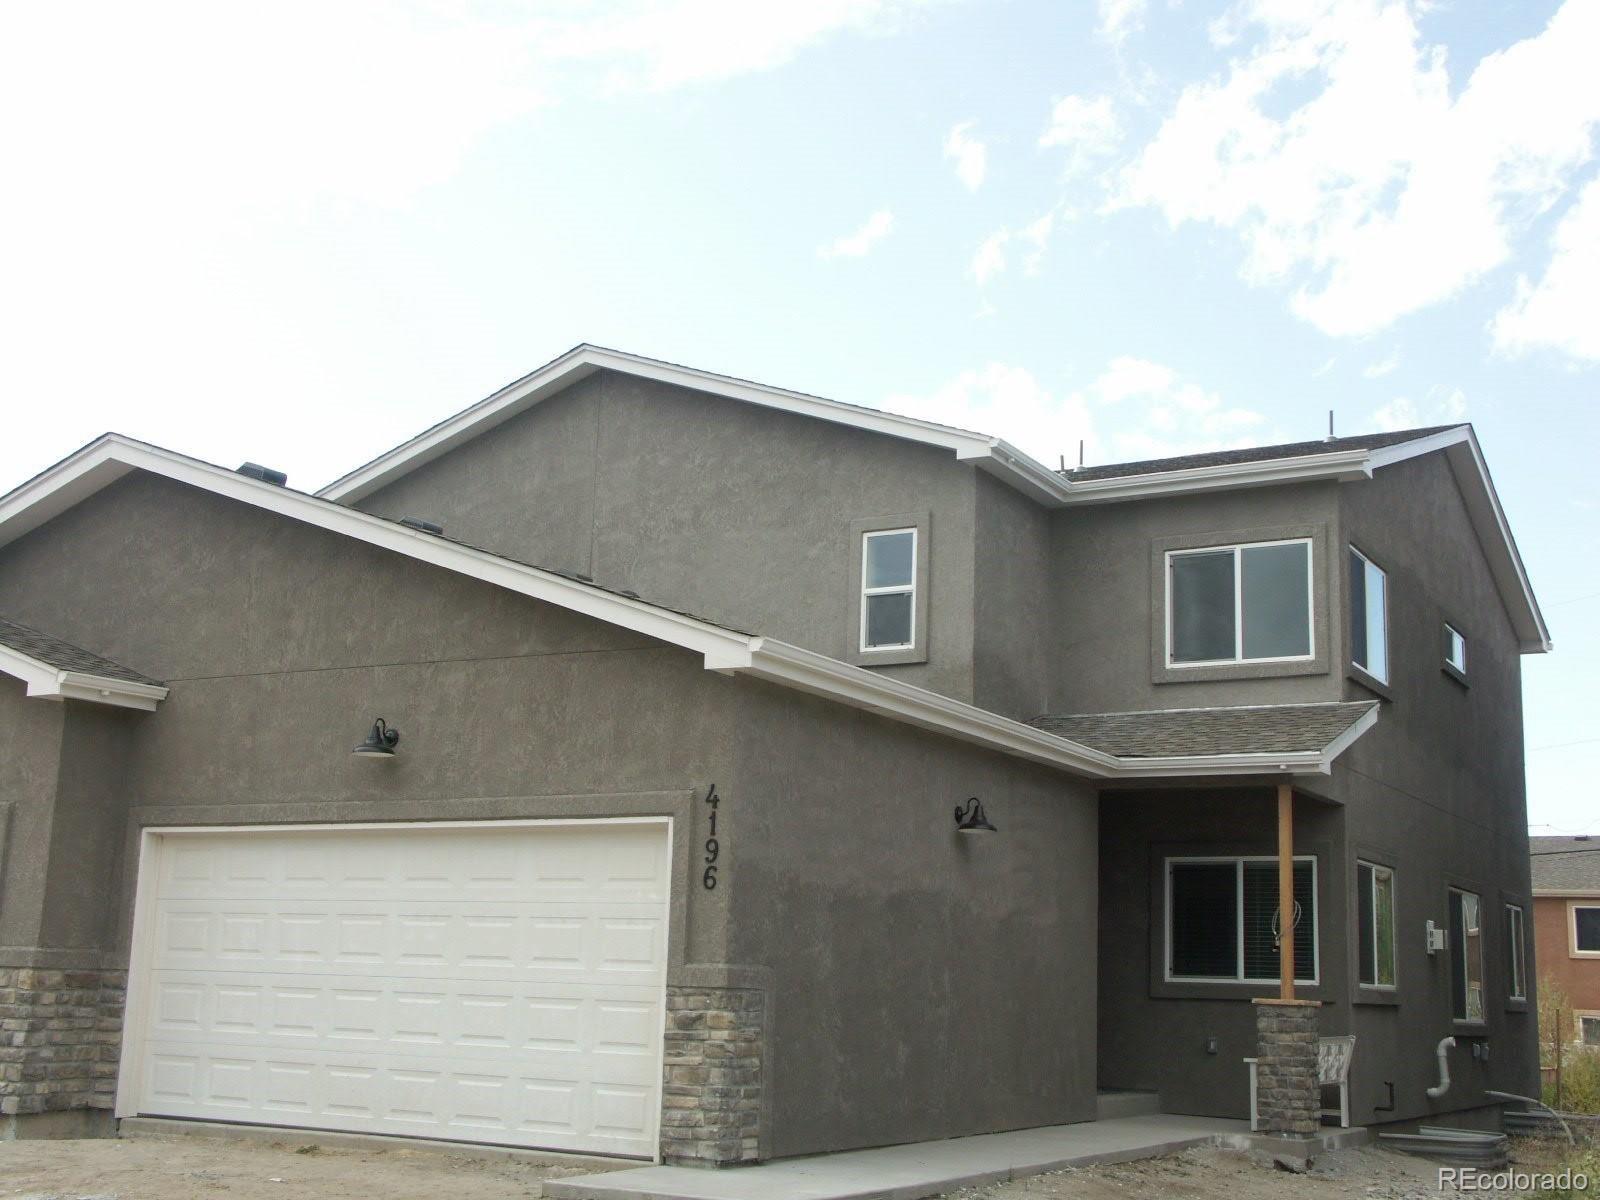 MLS# 4421391 - 39 - 4196 Orchid Street, Colorado Springs, CO 80917